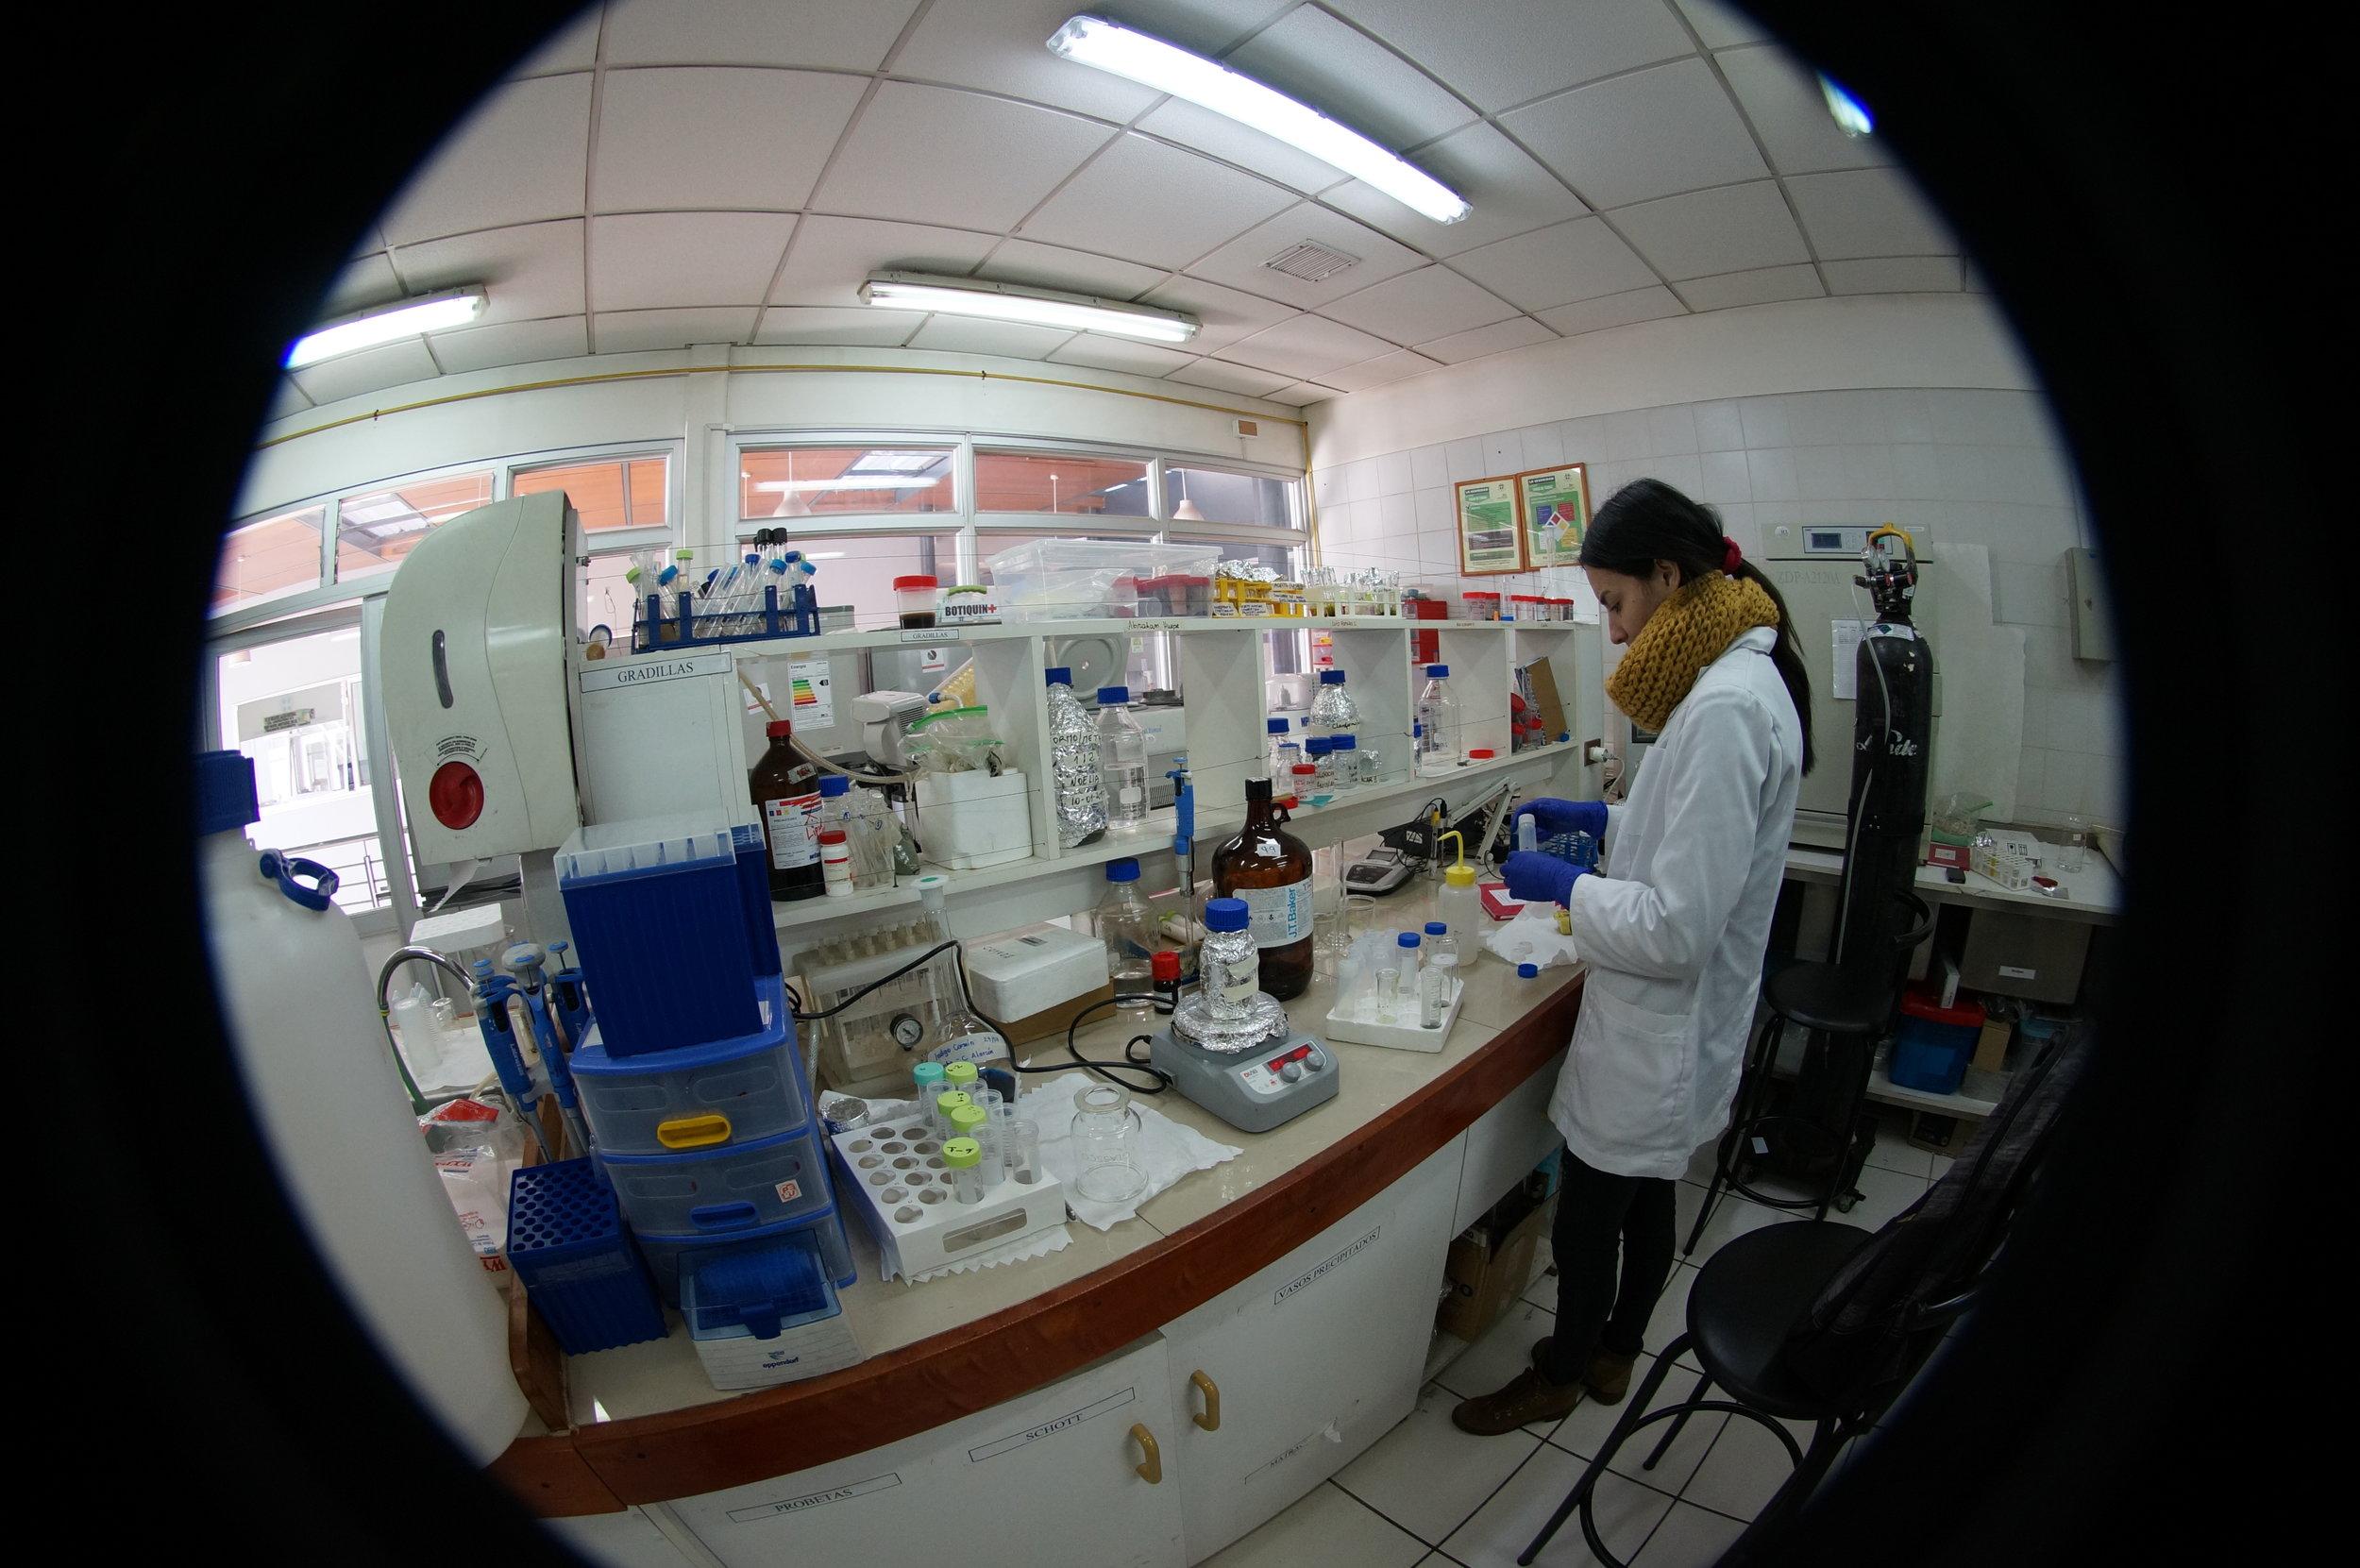 BIOREN LAB microalgas testing for biodiesel.JPG